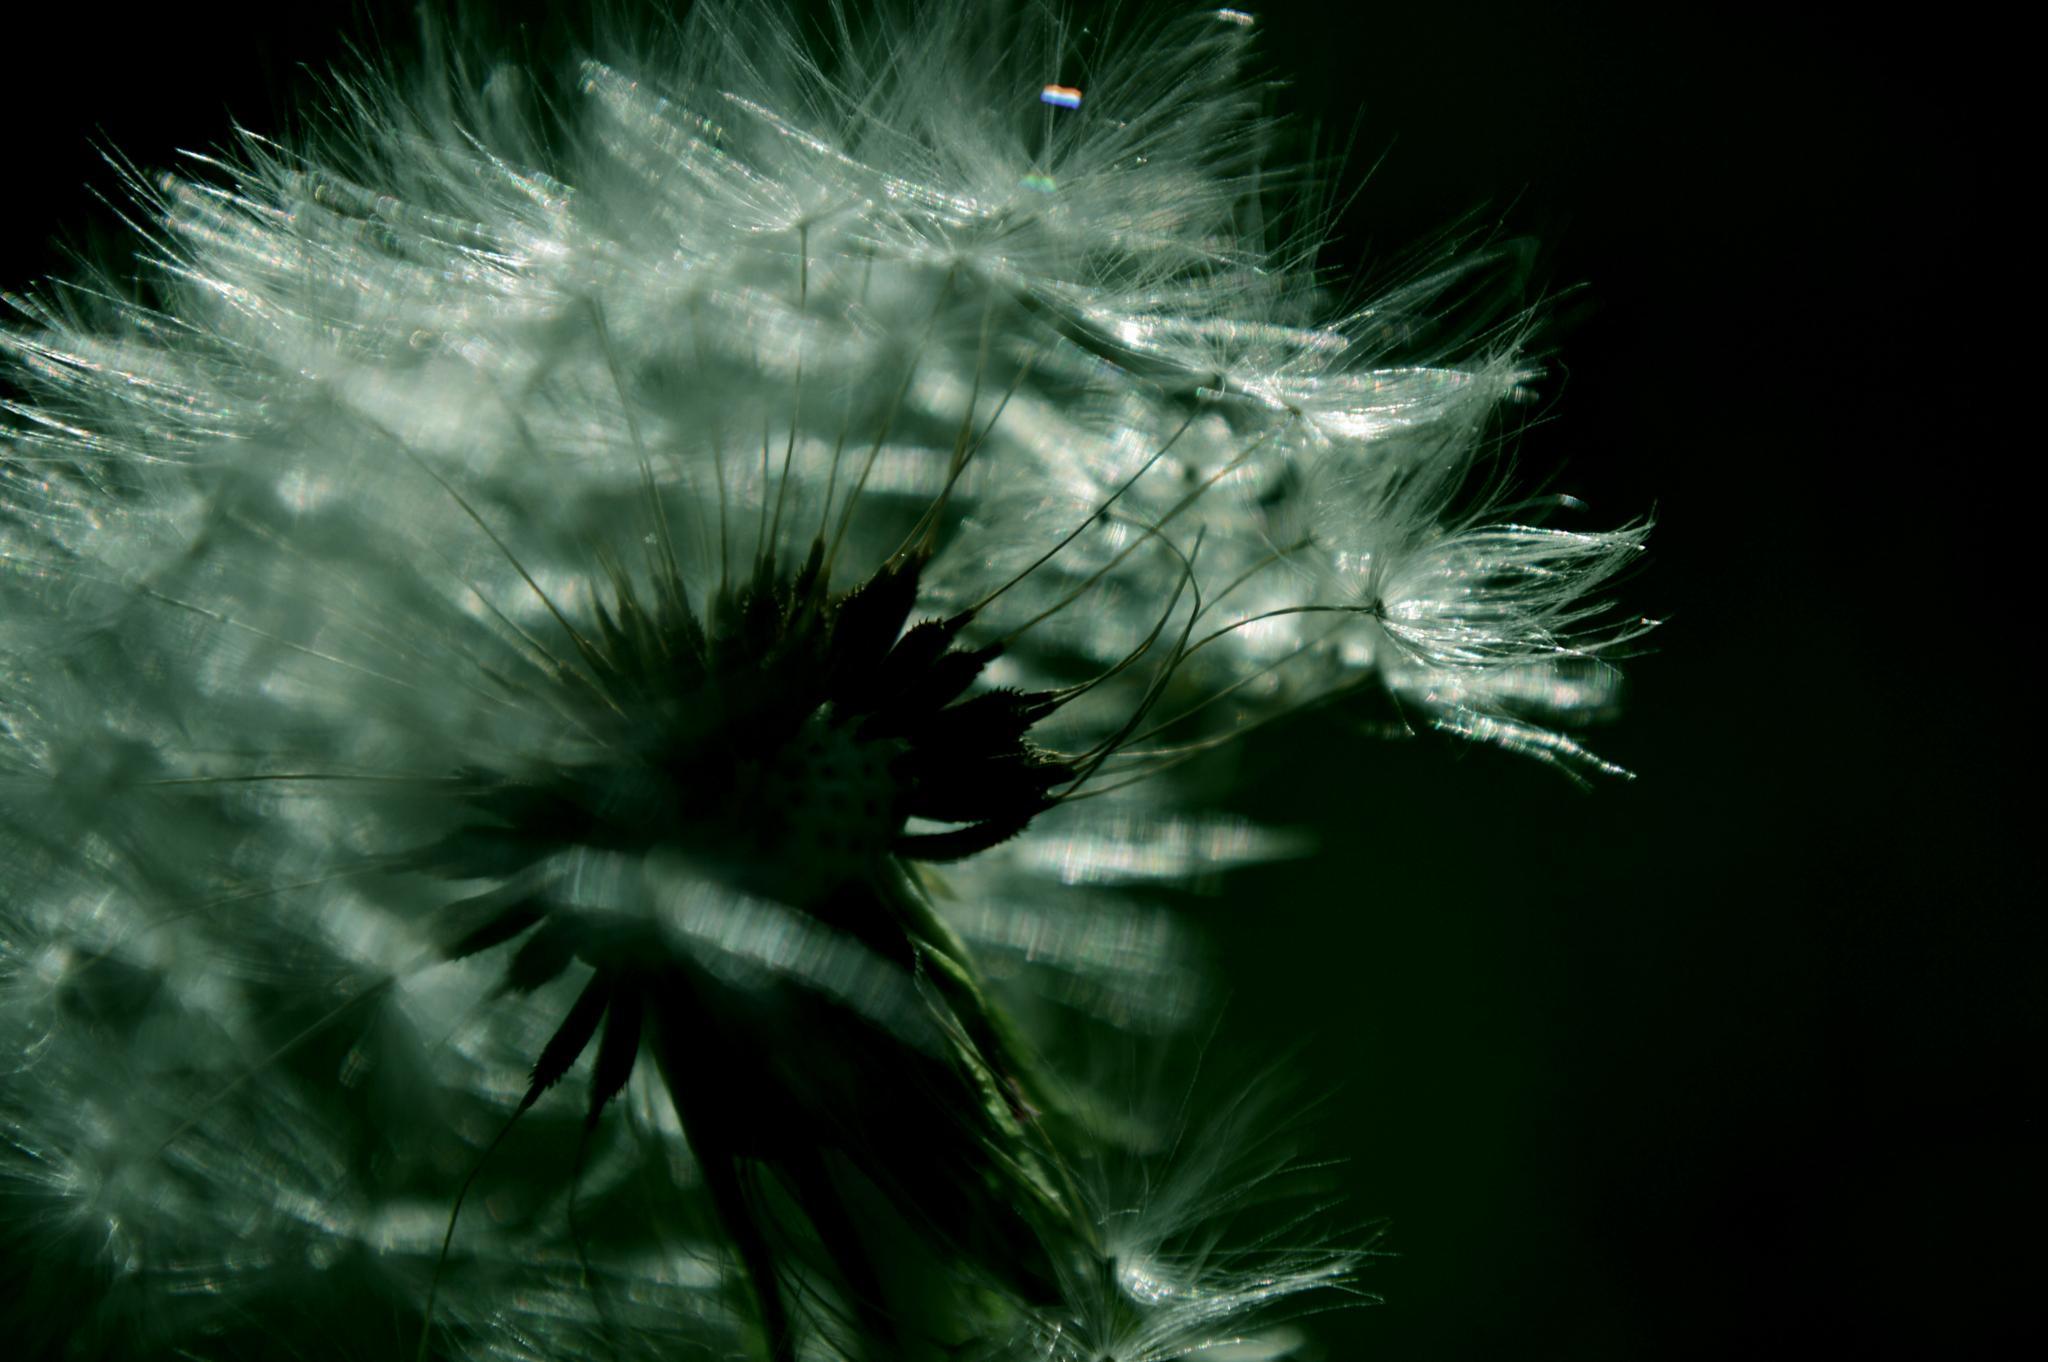 Ah..dramatic dandelion by Yoko D